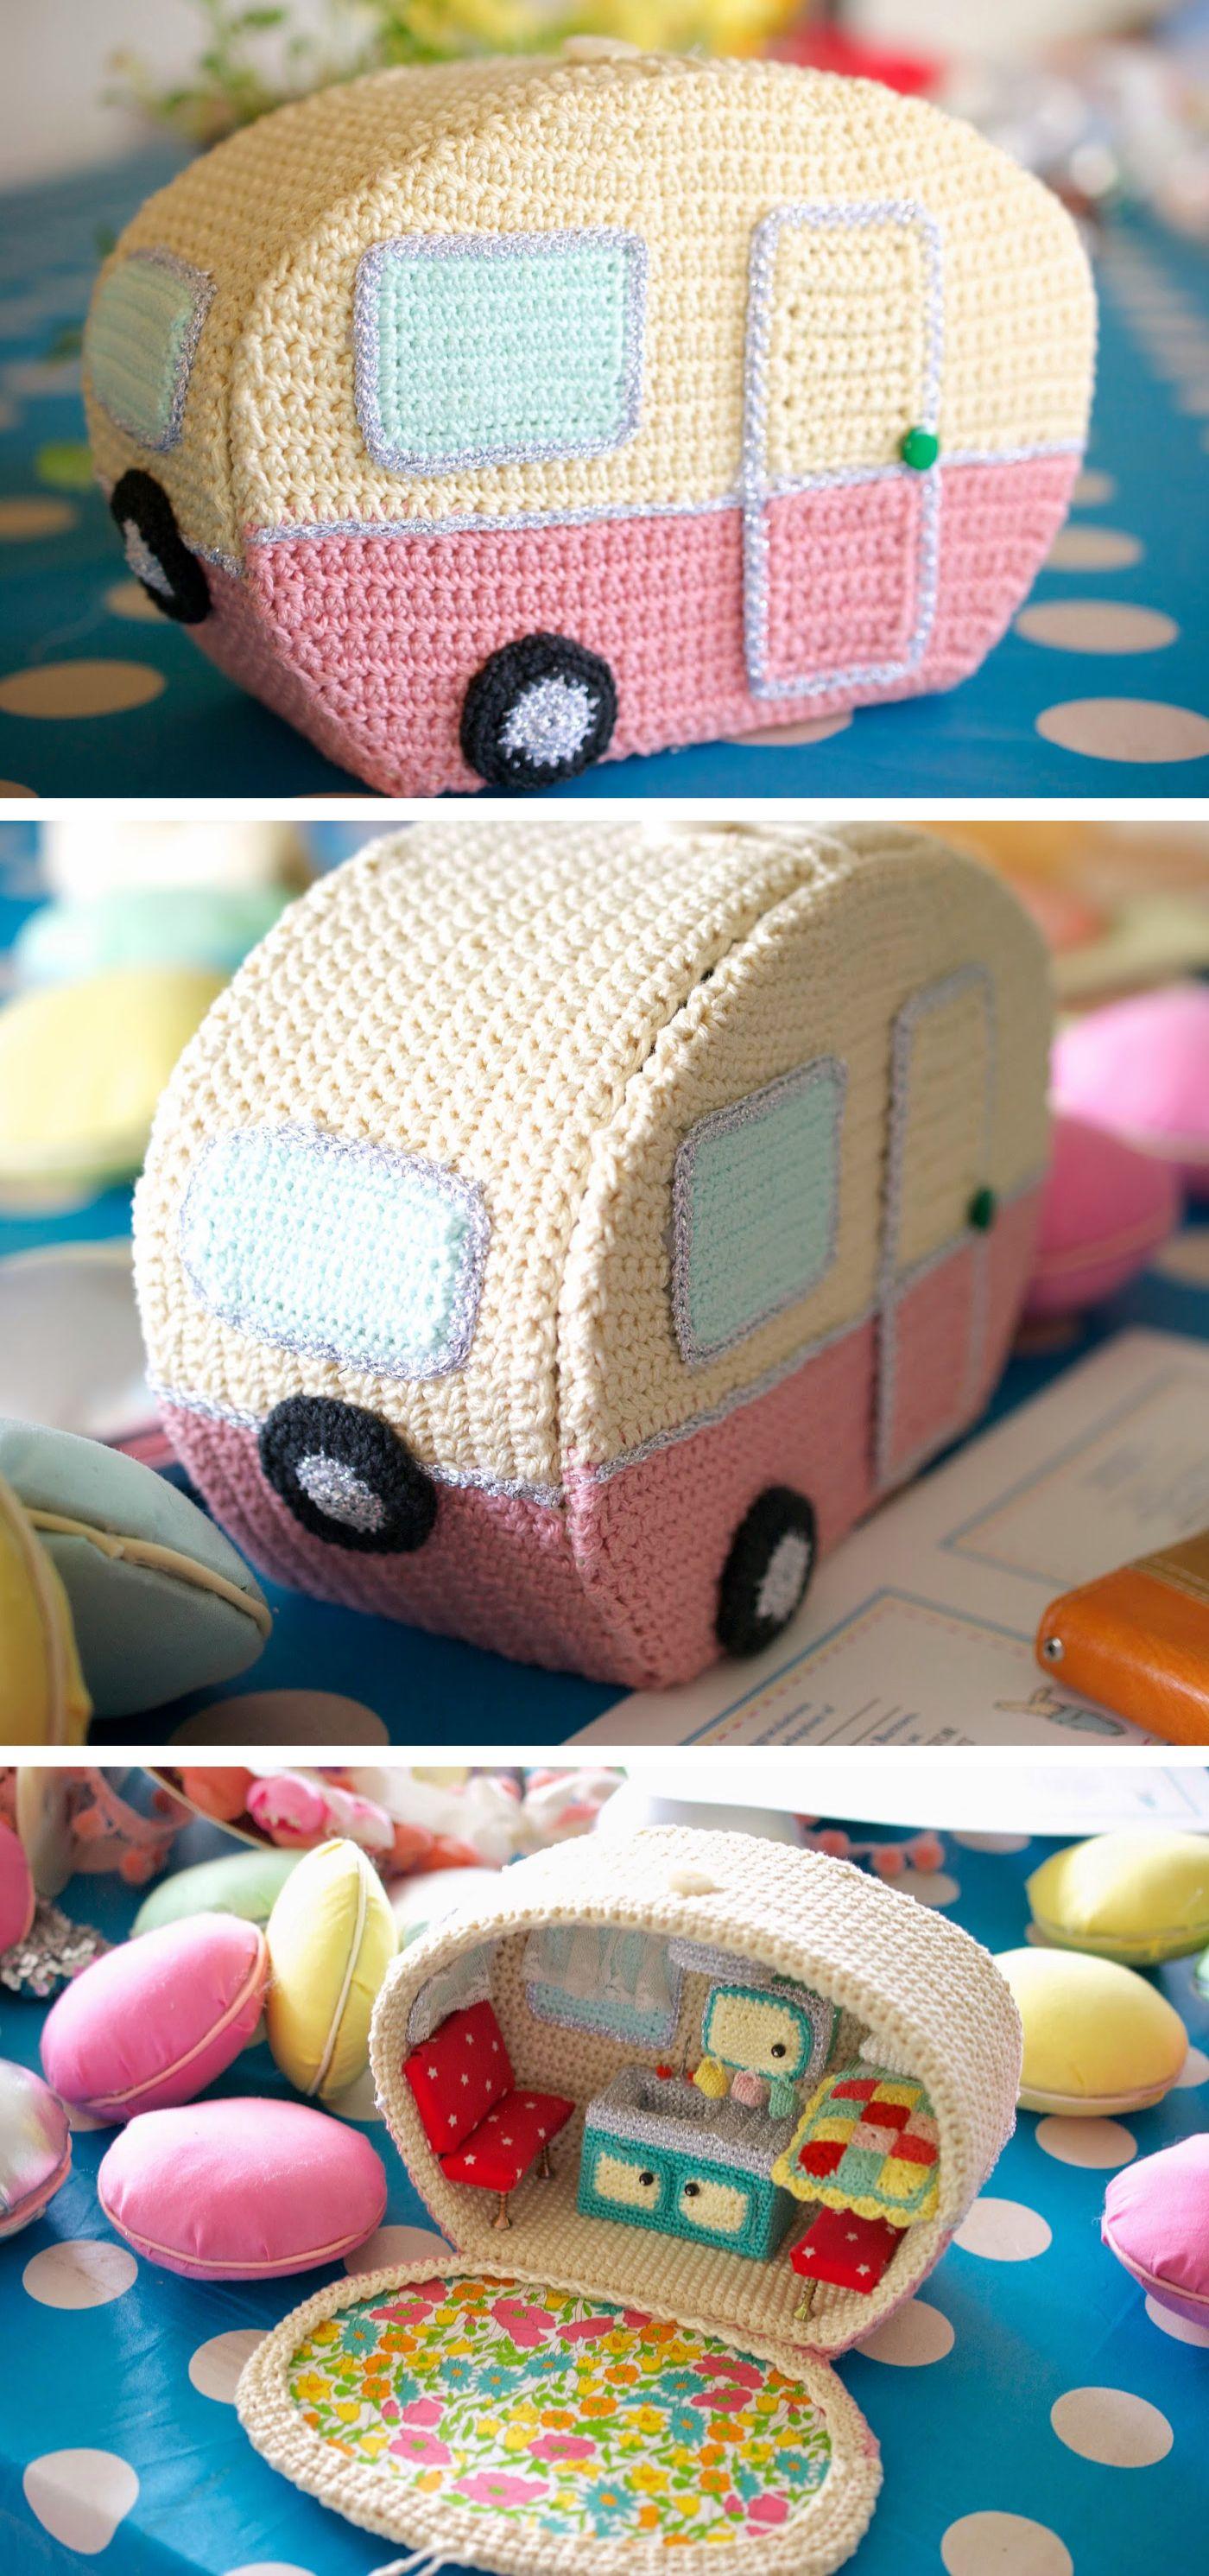 Crochet Caravan How Cute Diy Toys For Kids Pinterest